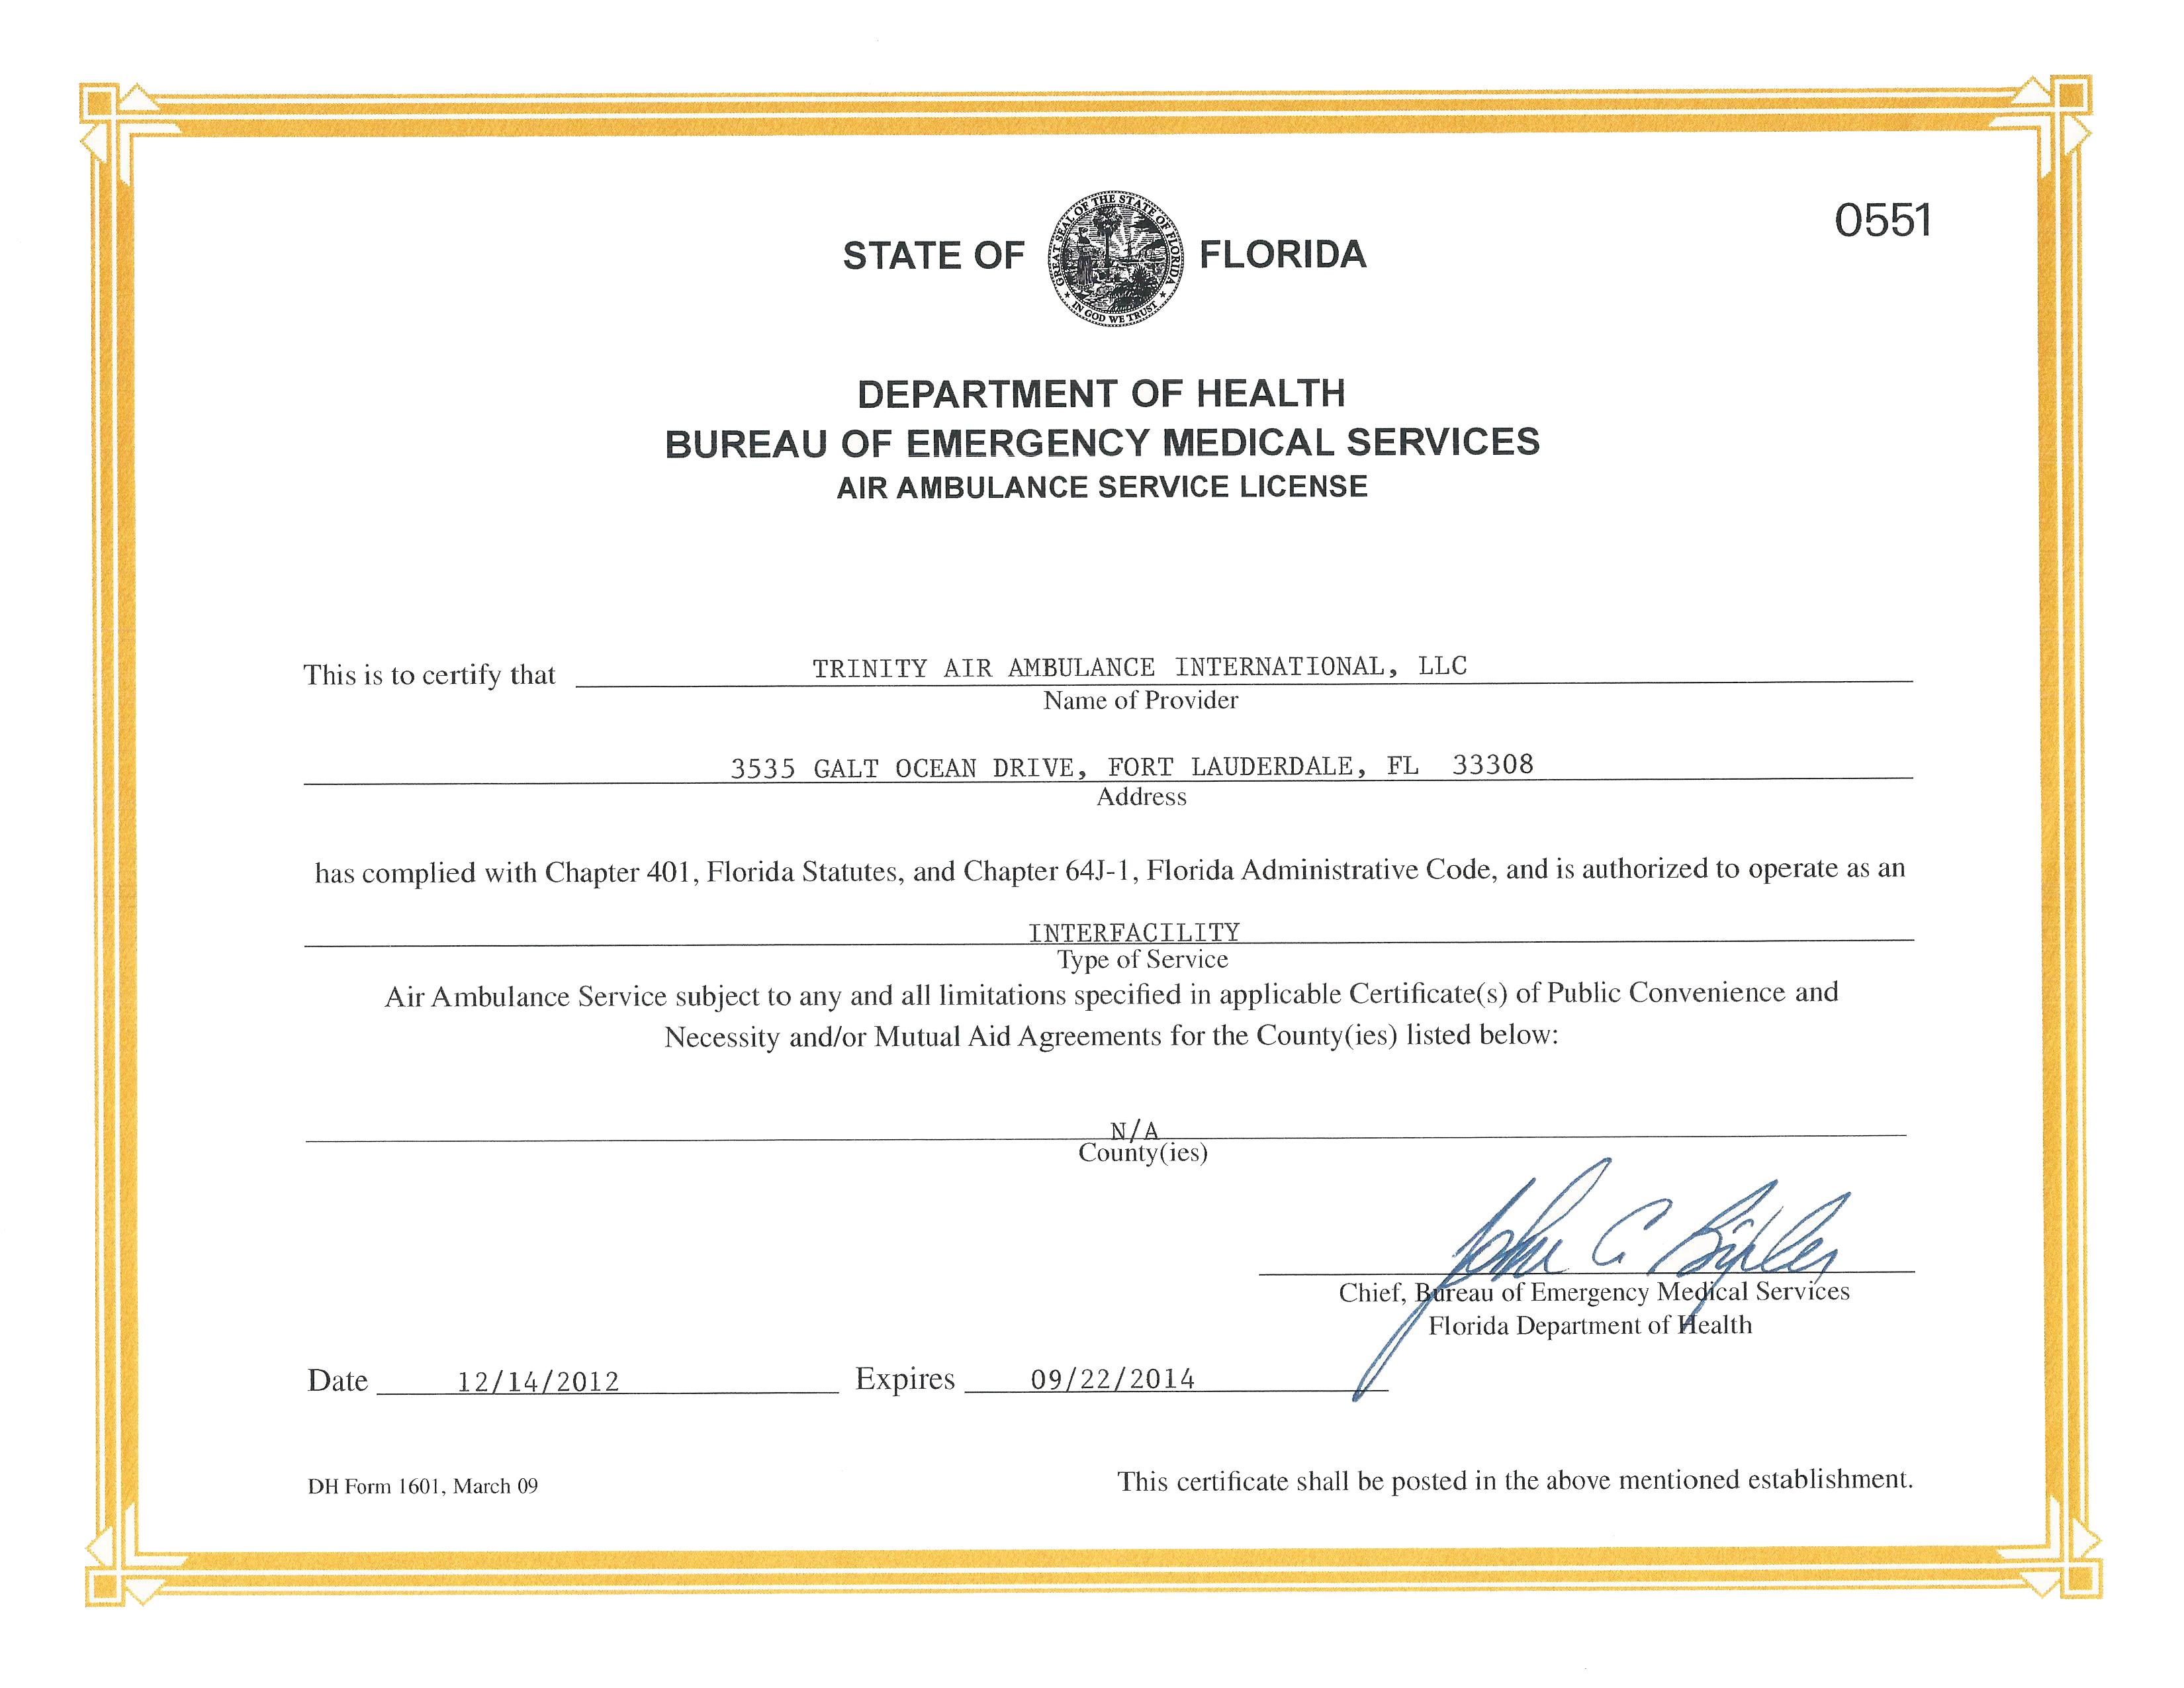 Trinity Air Ambulance Servive License 2012